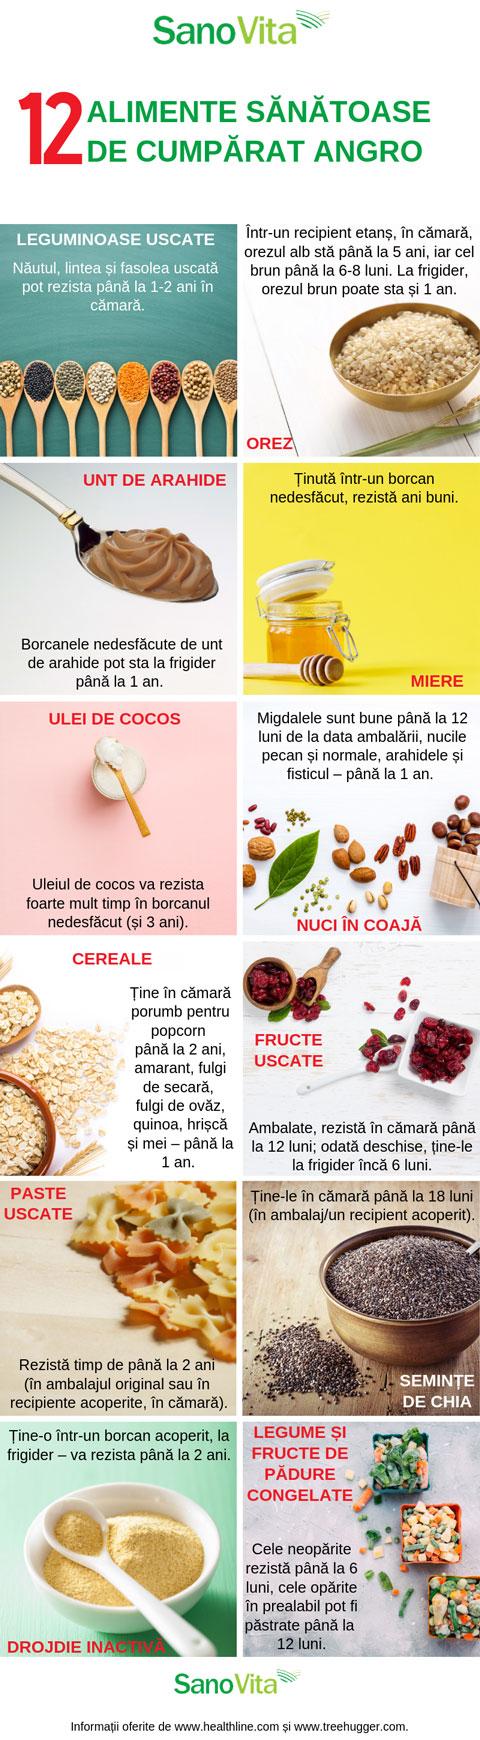 12 alimente sanatoase, de cumparat angro - infografic